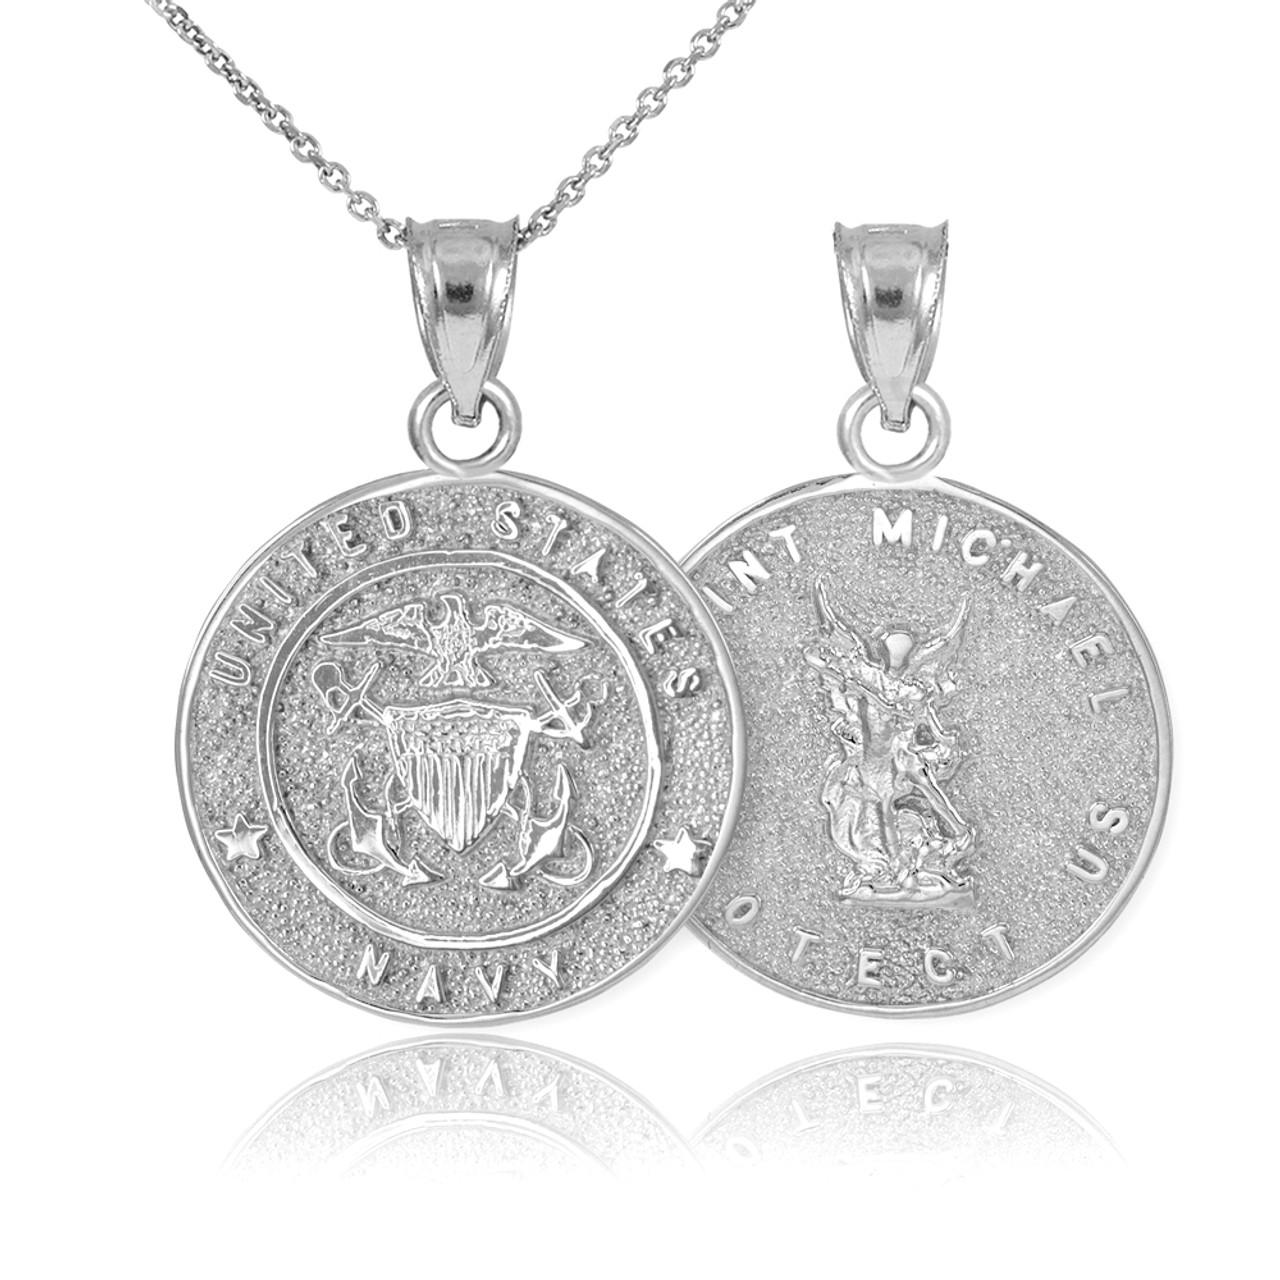 White gold us navy reversible st michael pendant necklace aloadofball Gallery